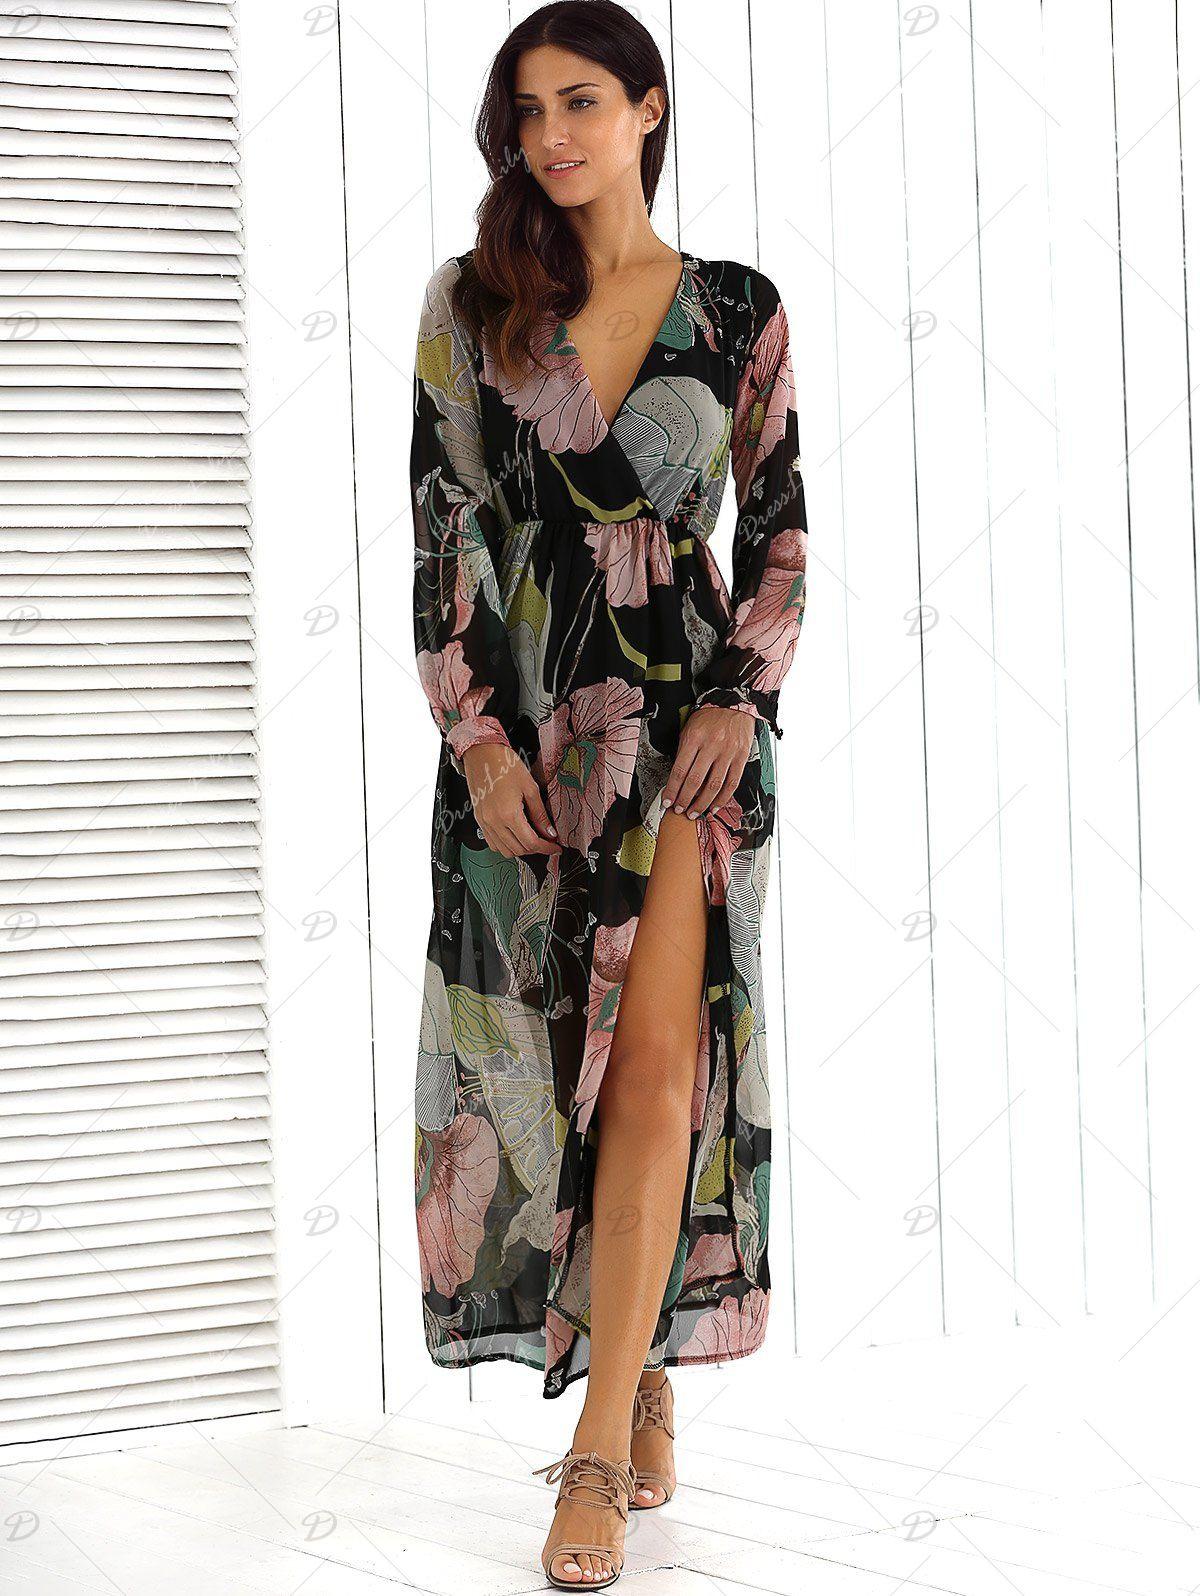 627c3c4608 Surplice Summer Floral Maxi Beach Dress with Slit